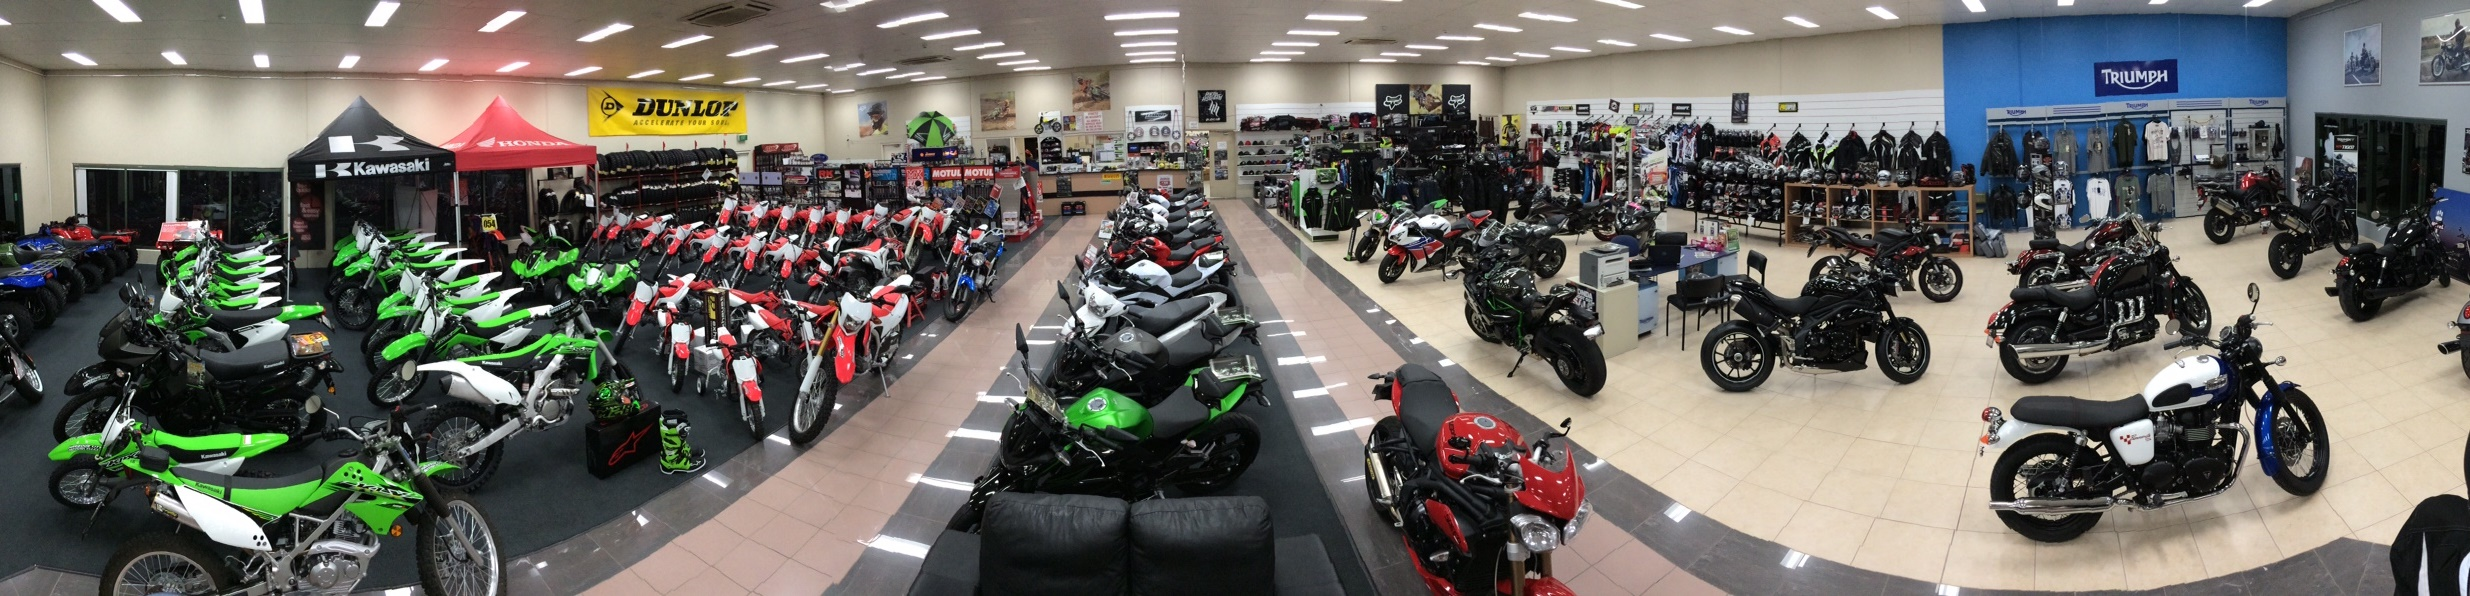 harbour city motorcycles - showroom